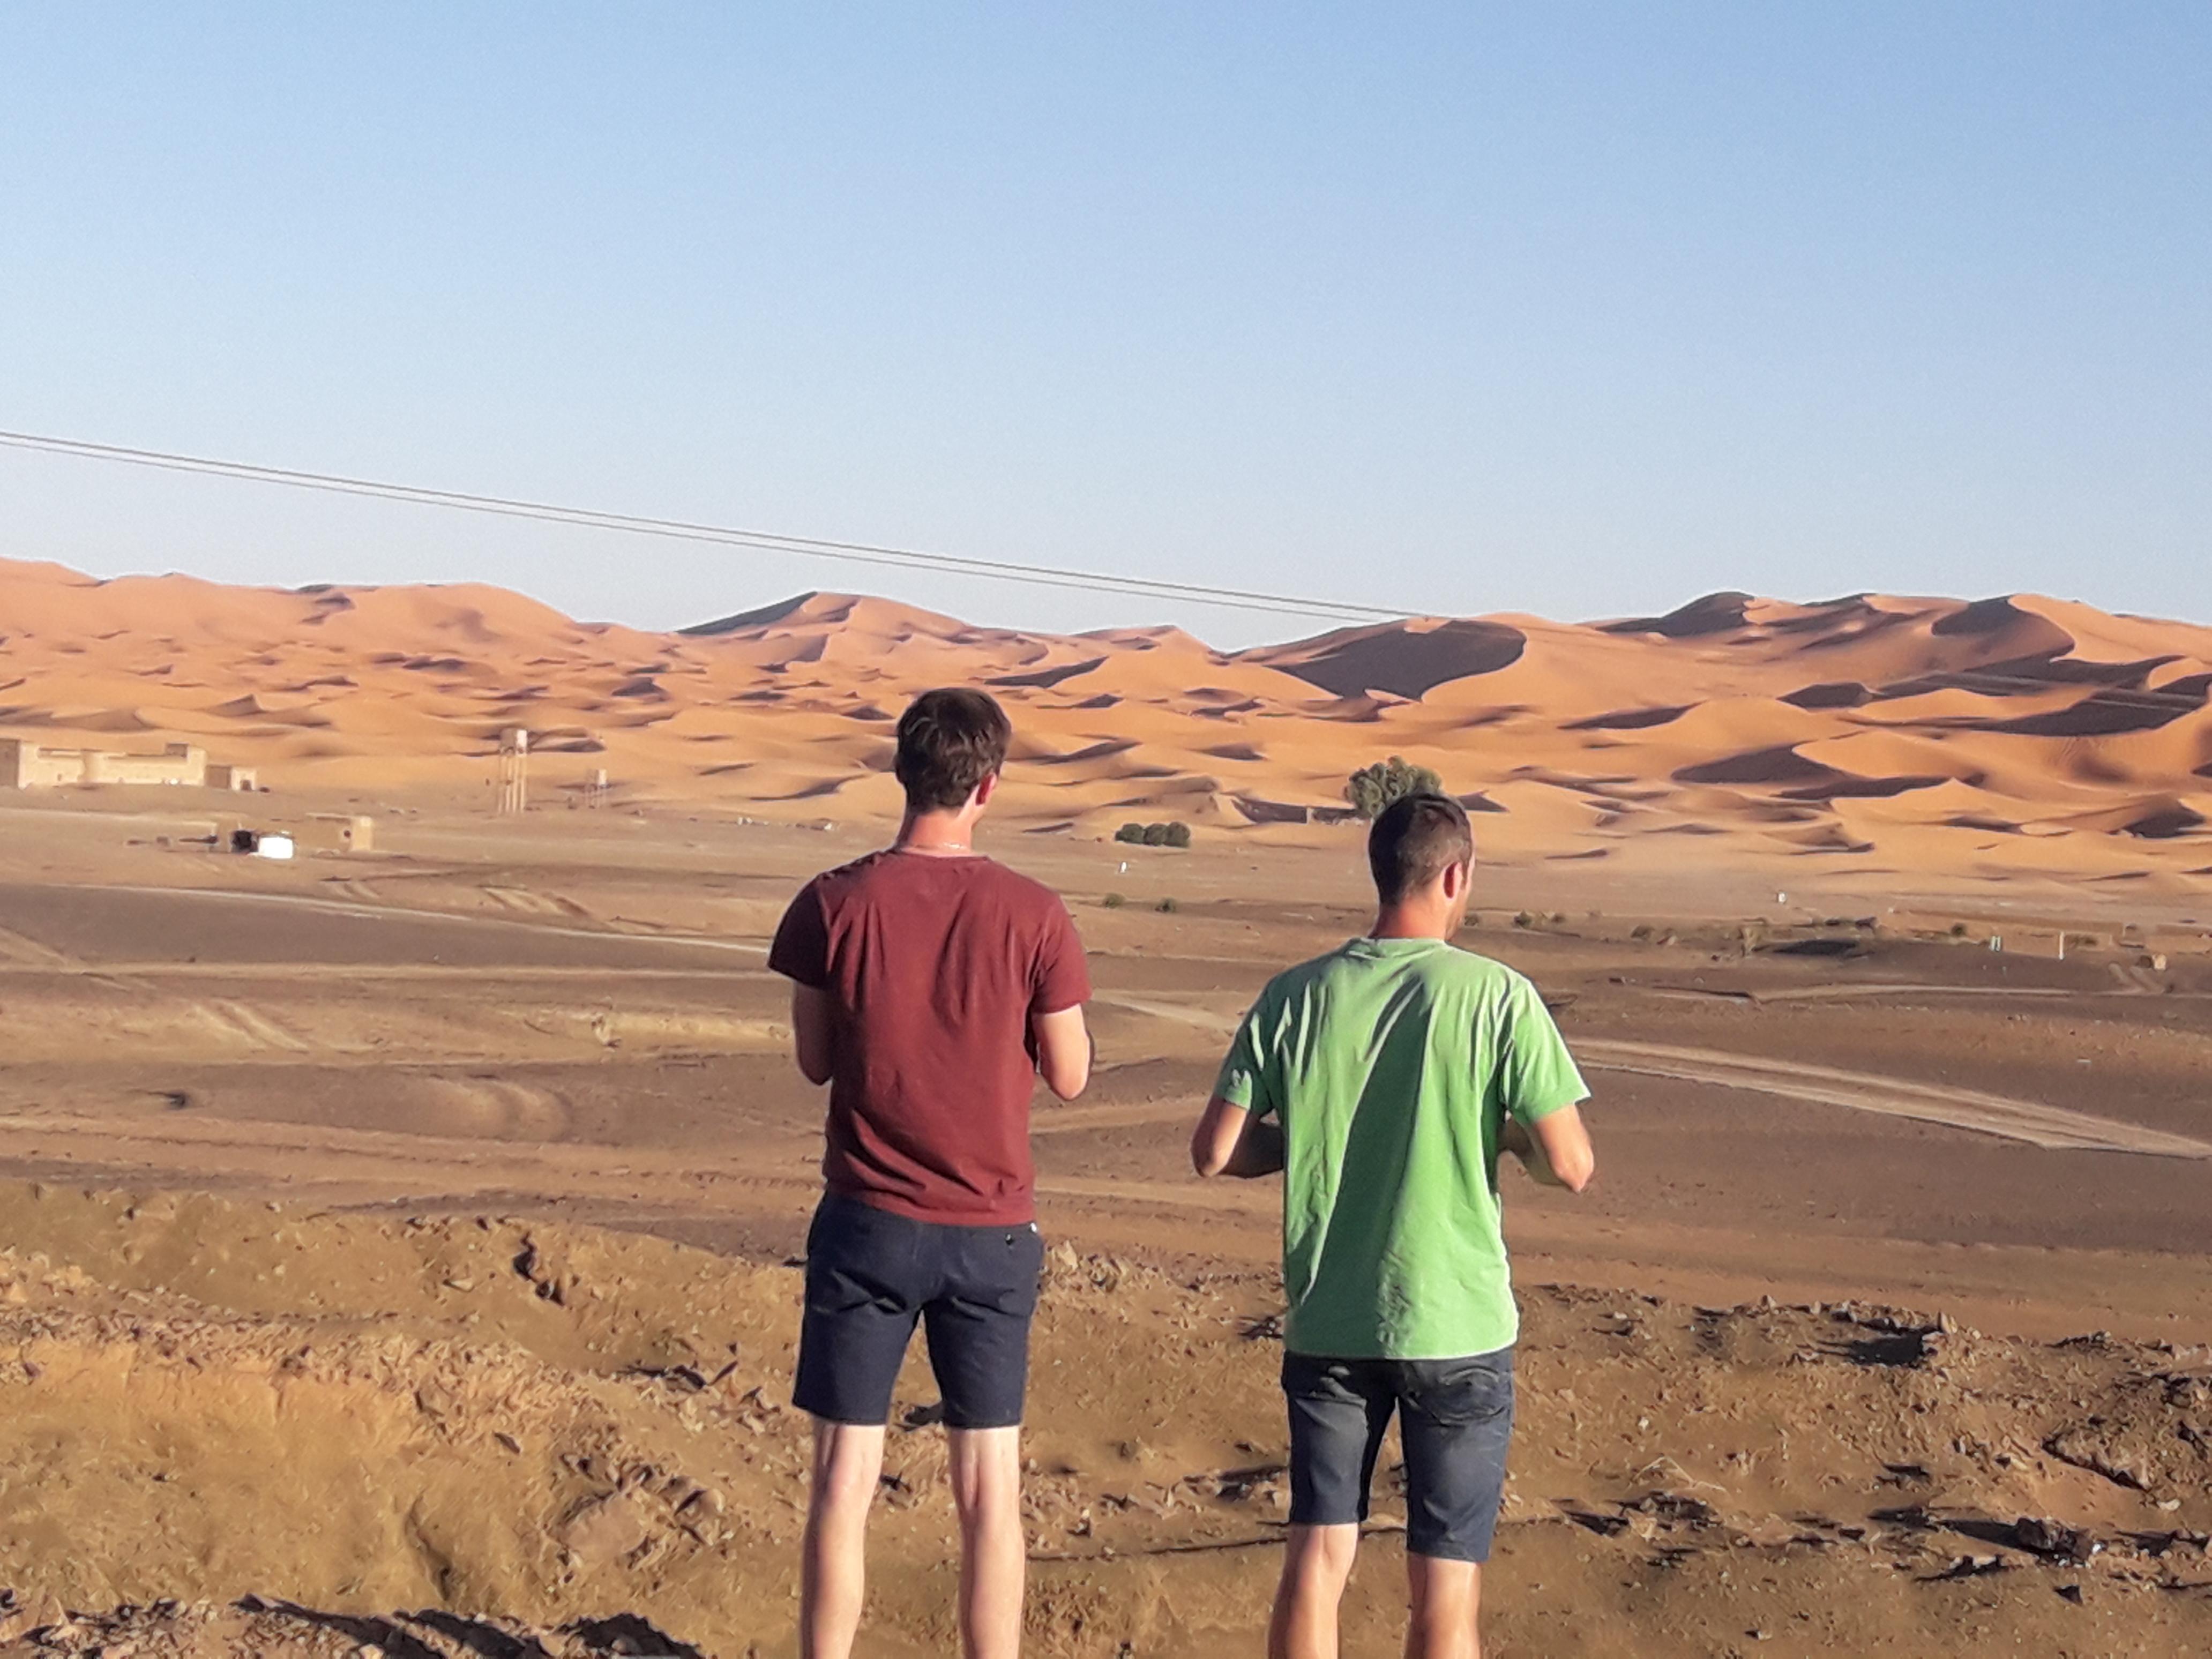 Marrakech Experiences Marruecos